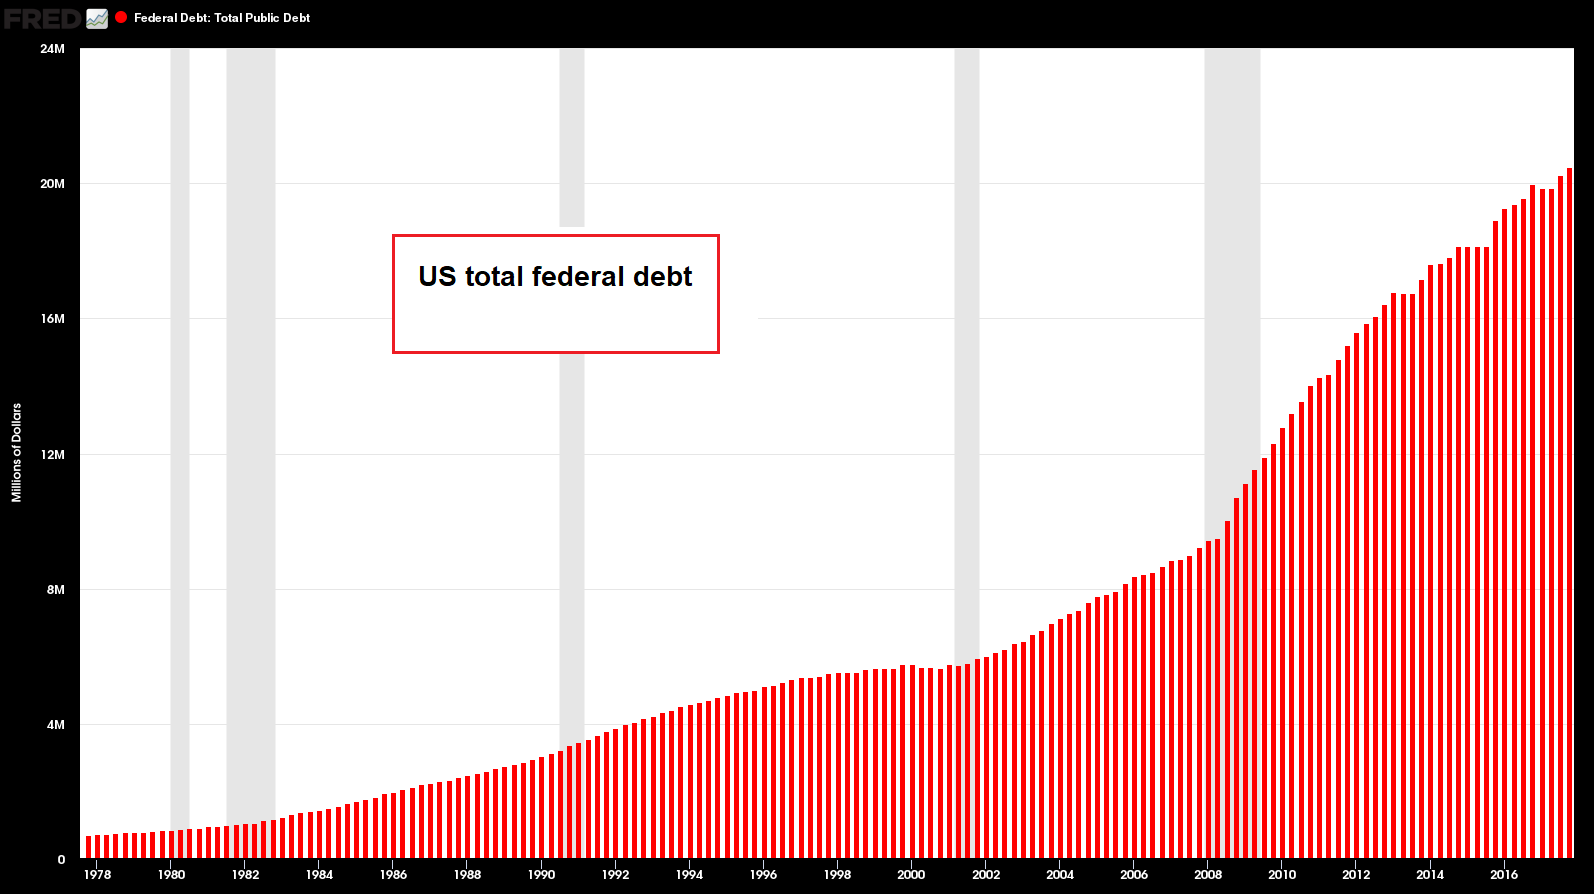 US Federal Debt, 1978 - 2018